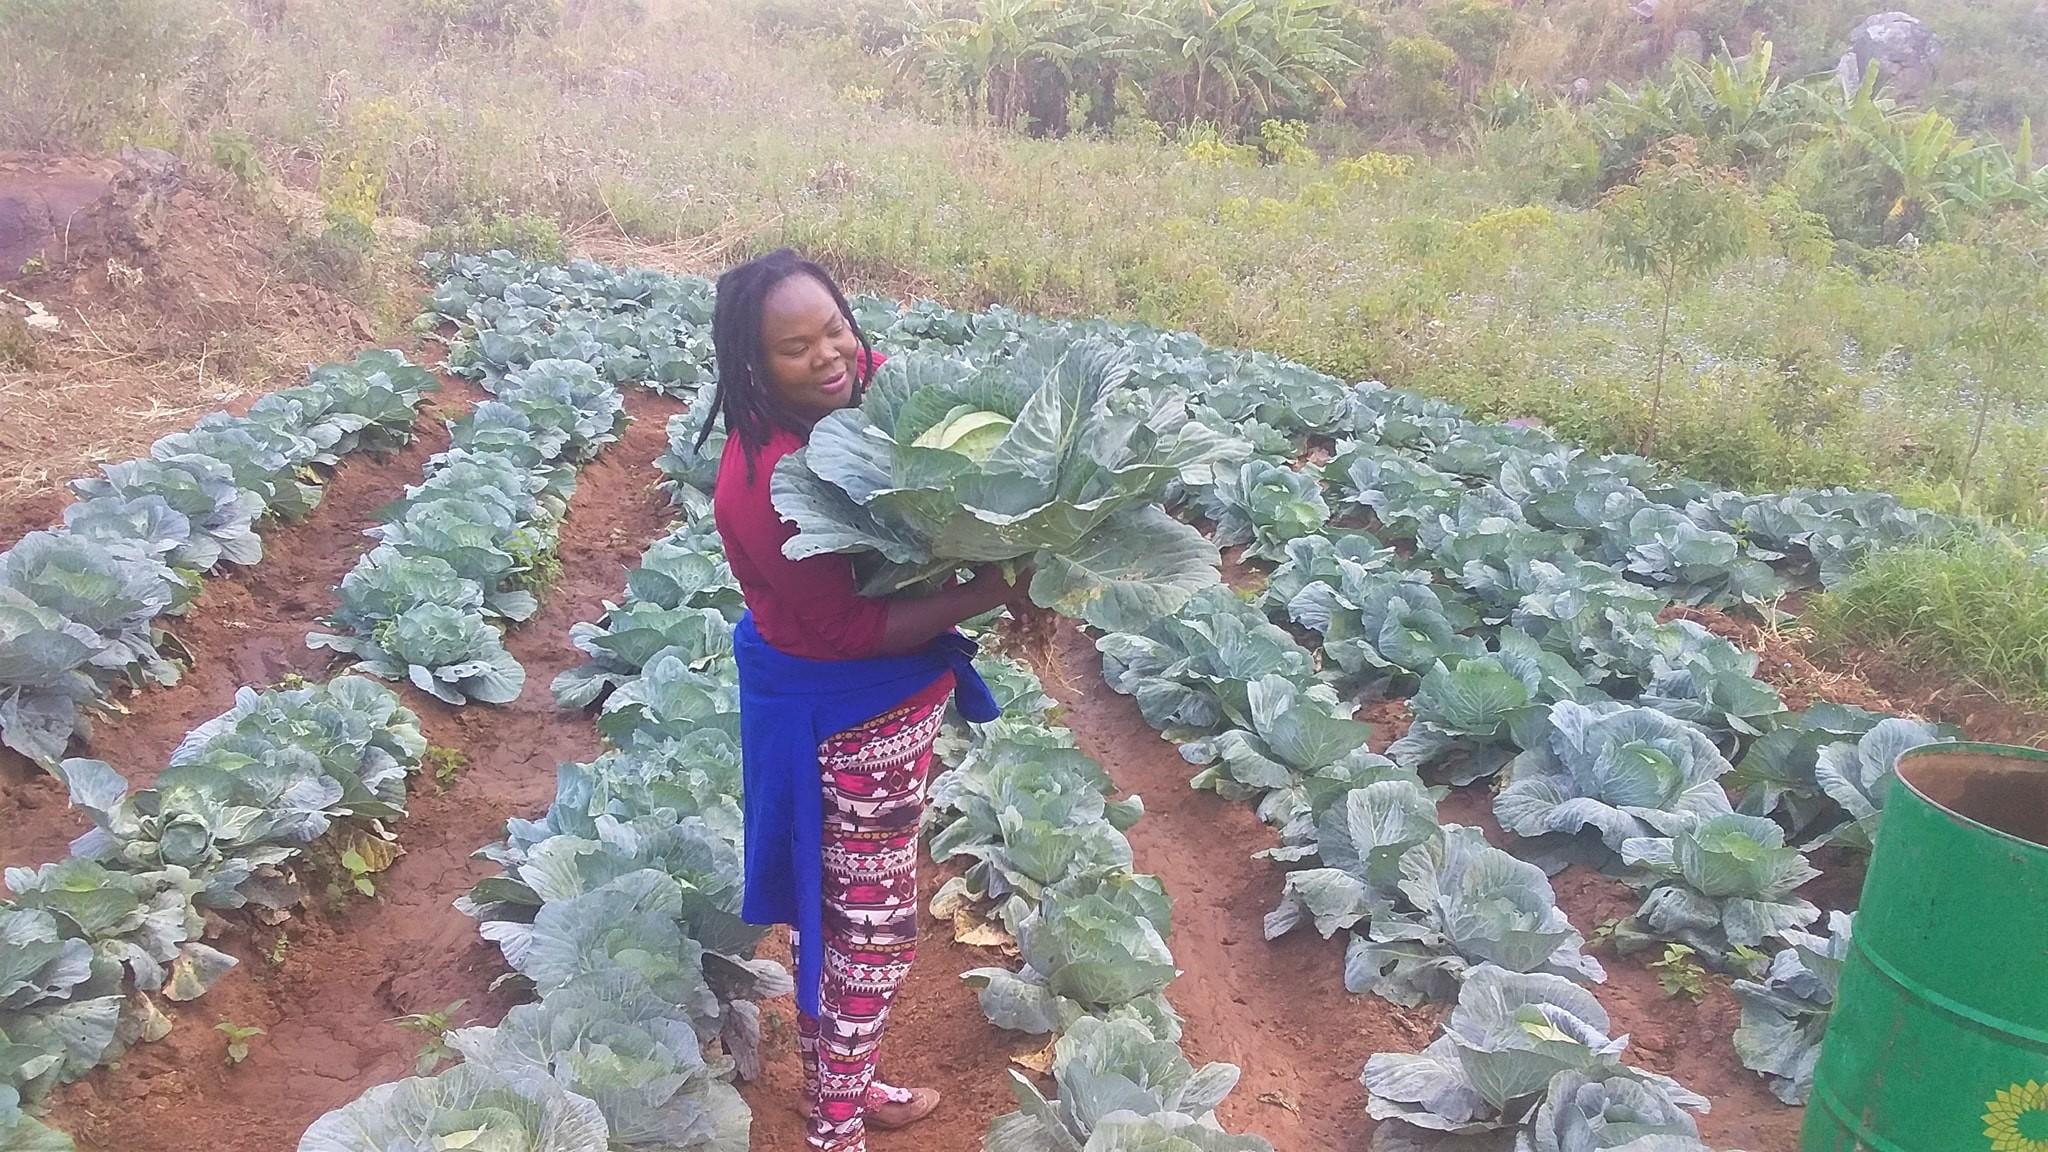 Tac-Maz Investments founder, Thokozani Chimasula, surveying a recent harvest.  Photo courtesy of Tac-Maz Investments.